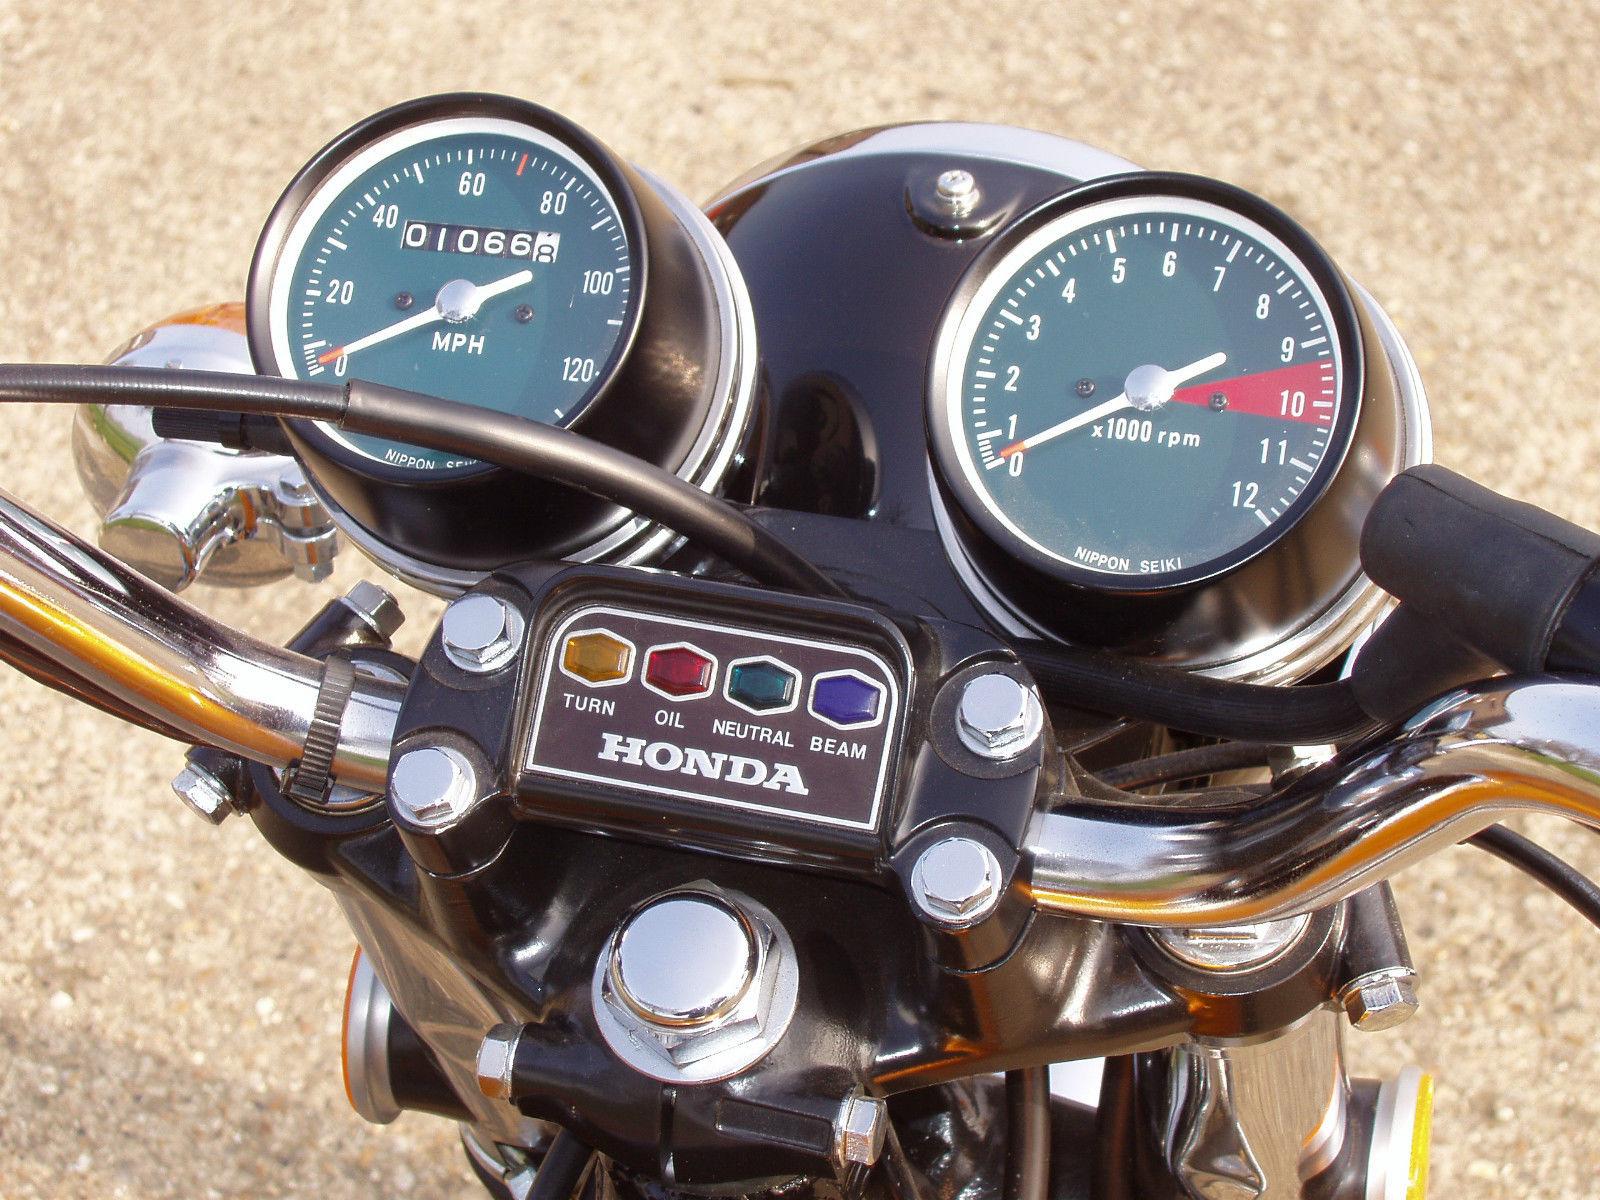 Honda CB500 Four - 1971 - Warning Lights, Handlebars, Speedo and Tacho.